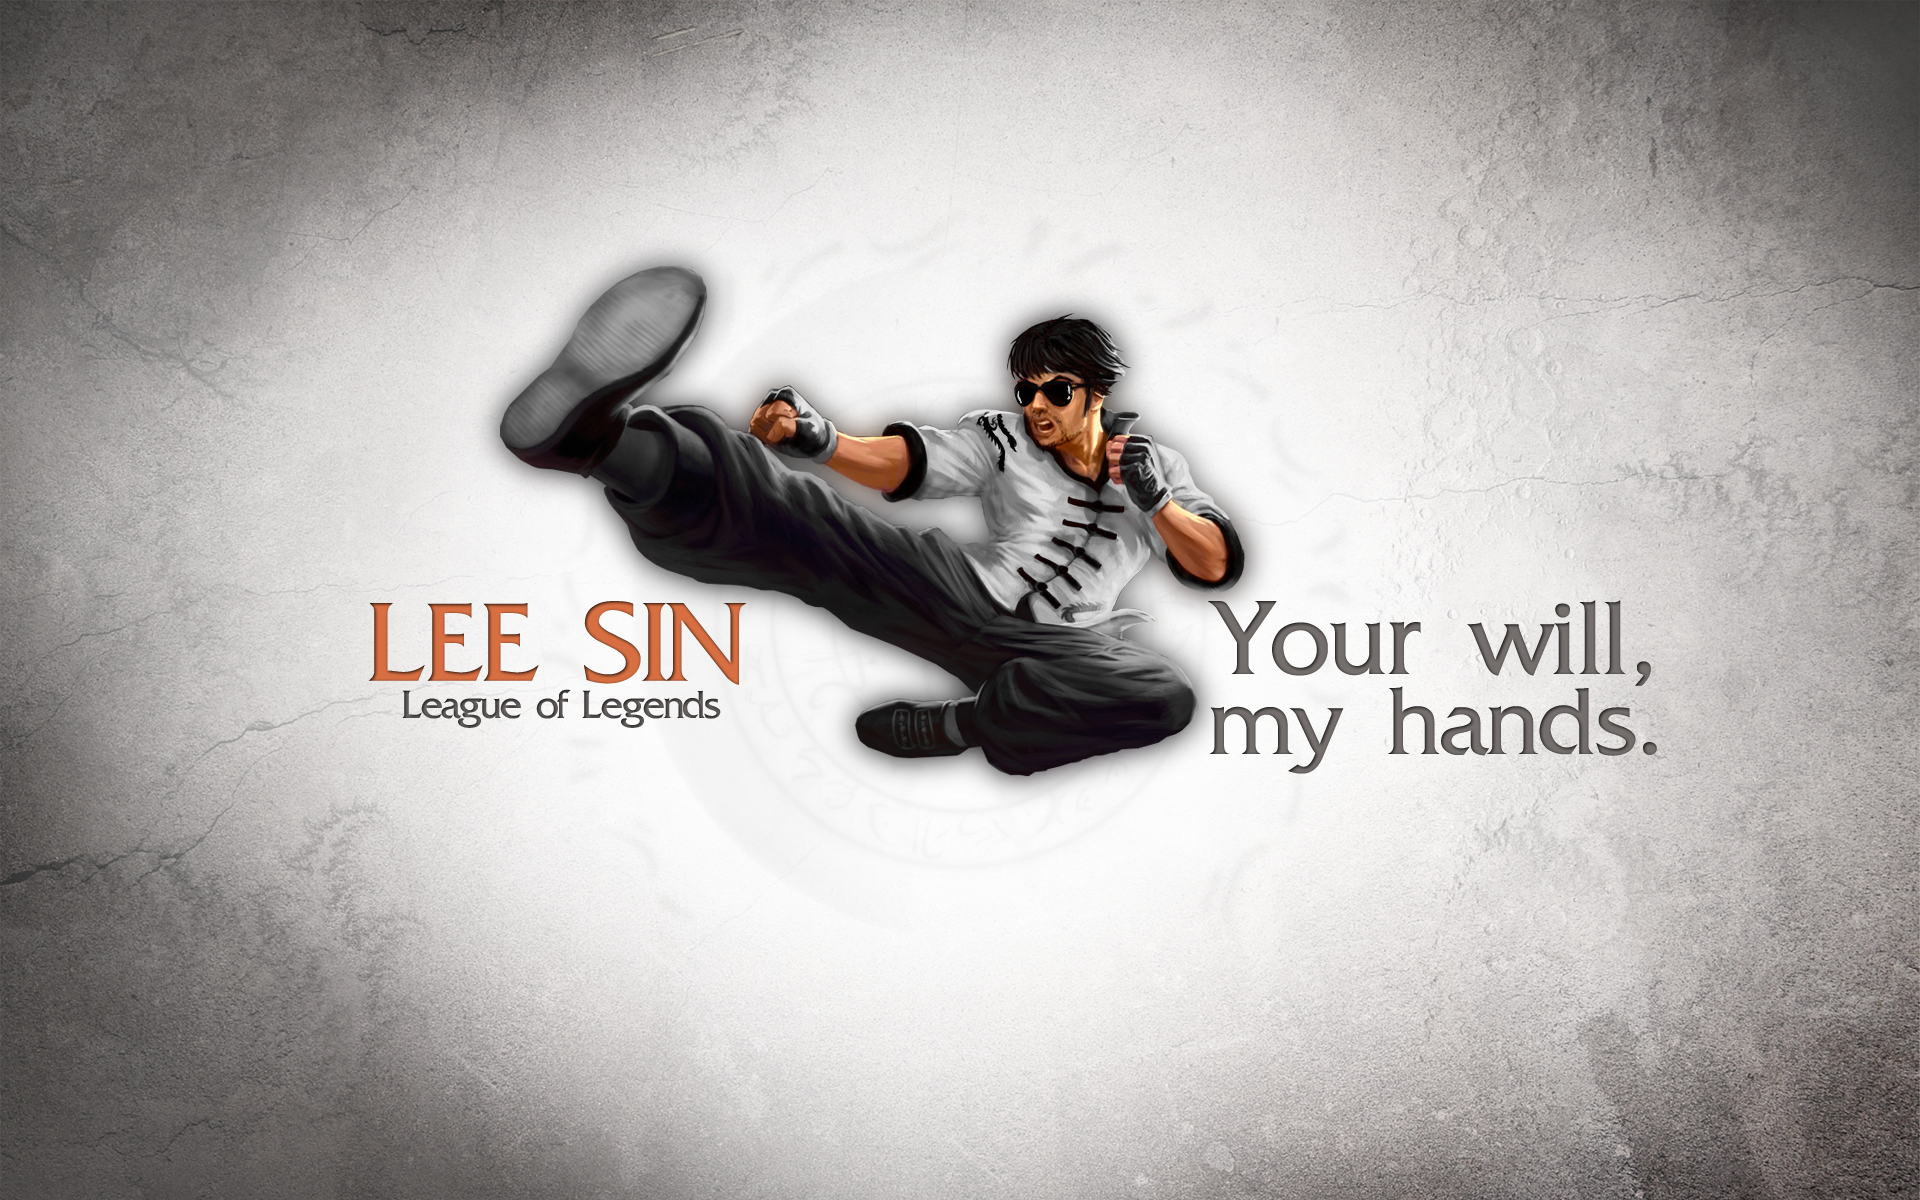 League of Legends Wallpaper - Lee Sin by deSess